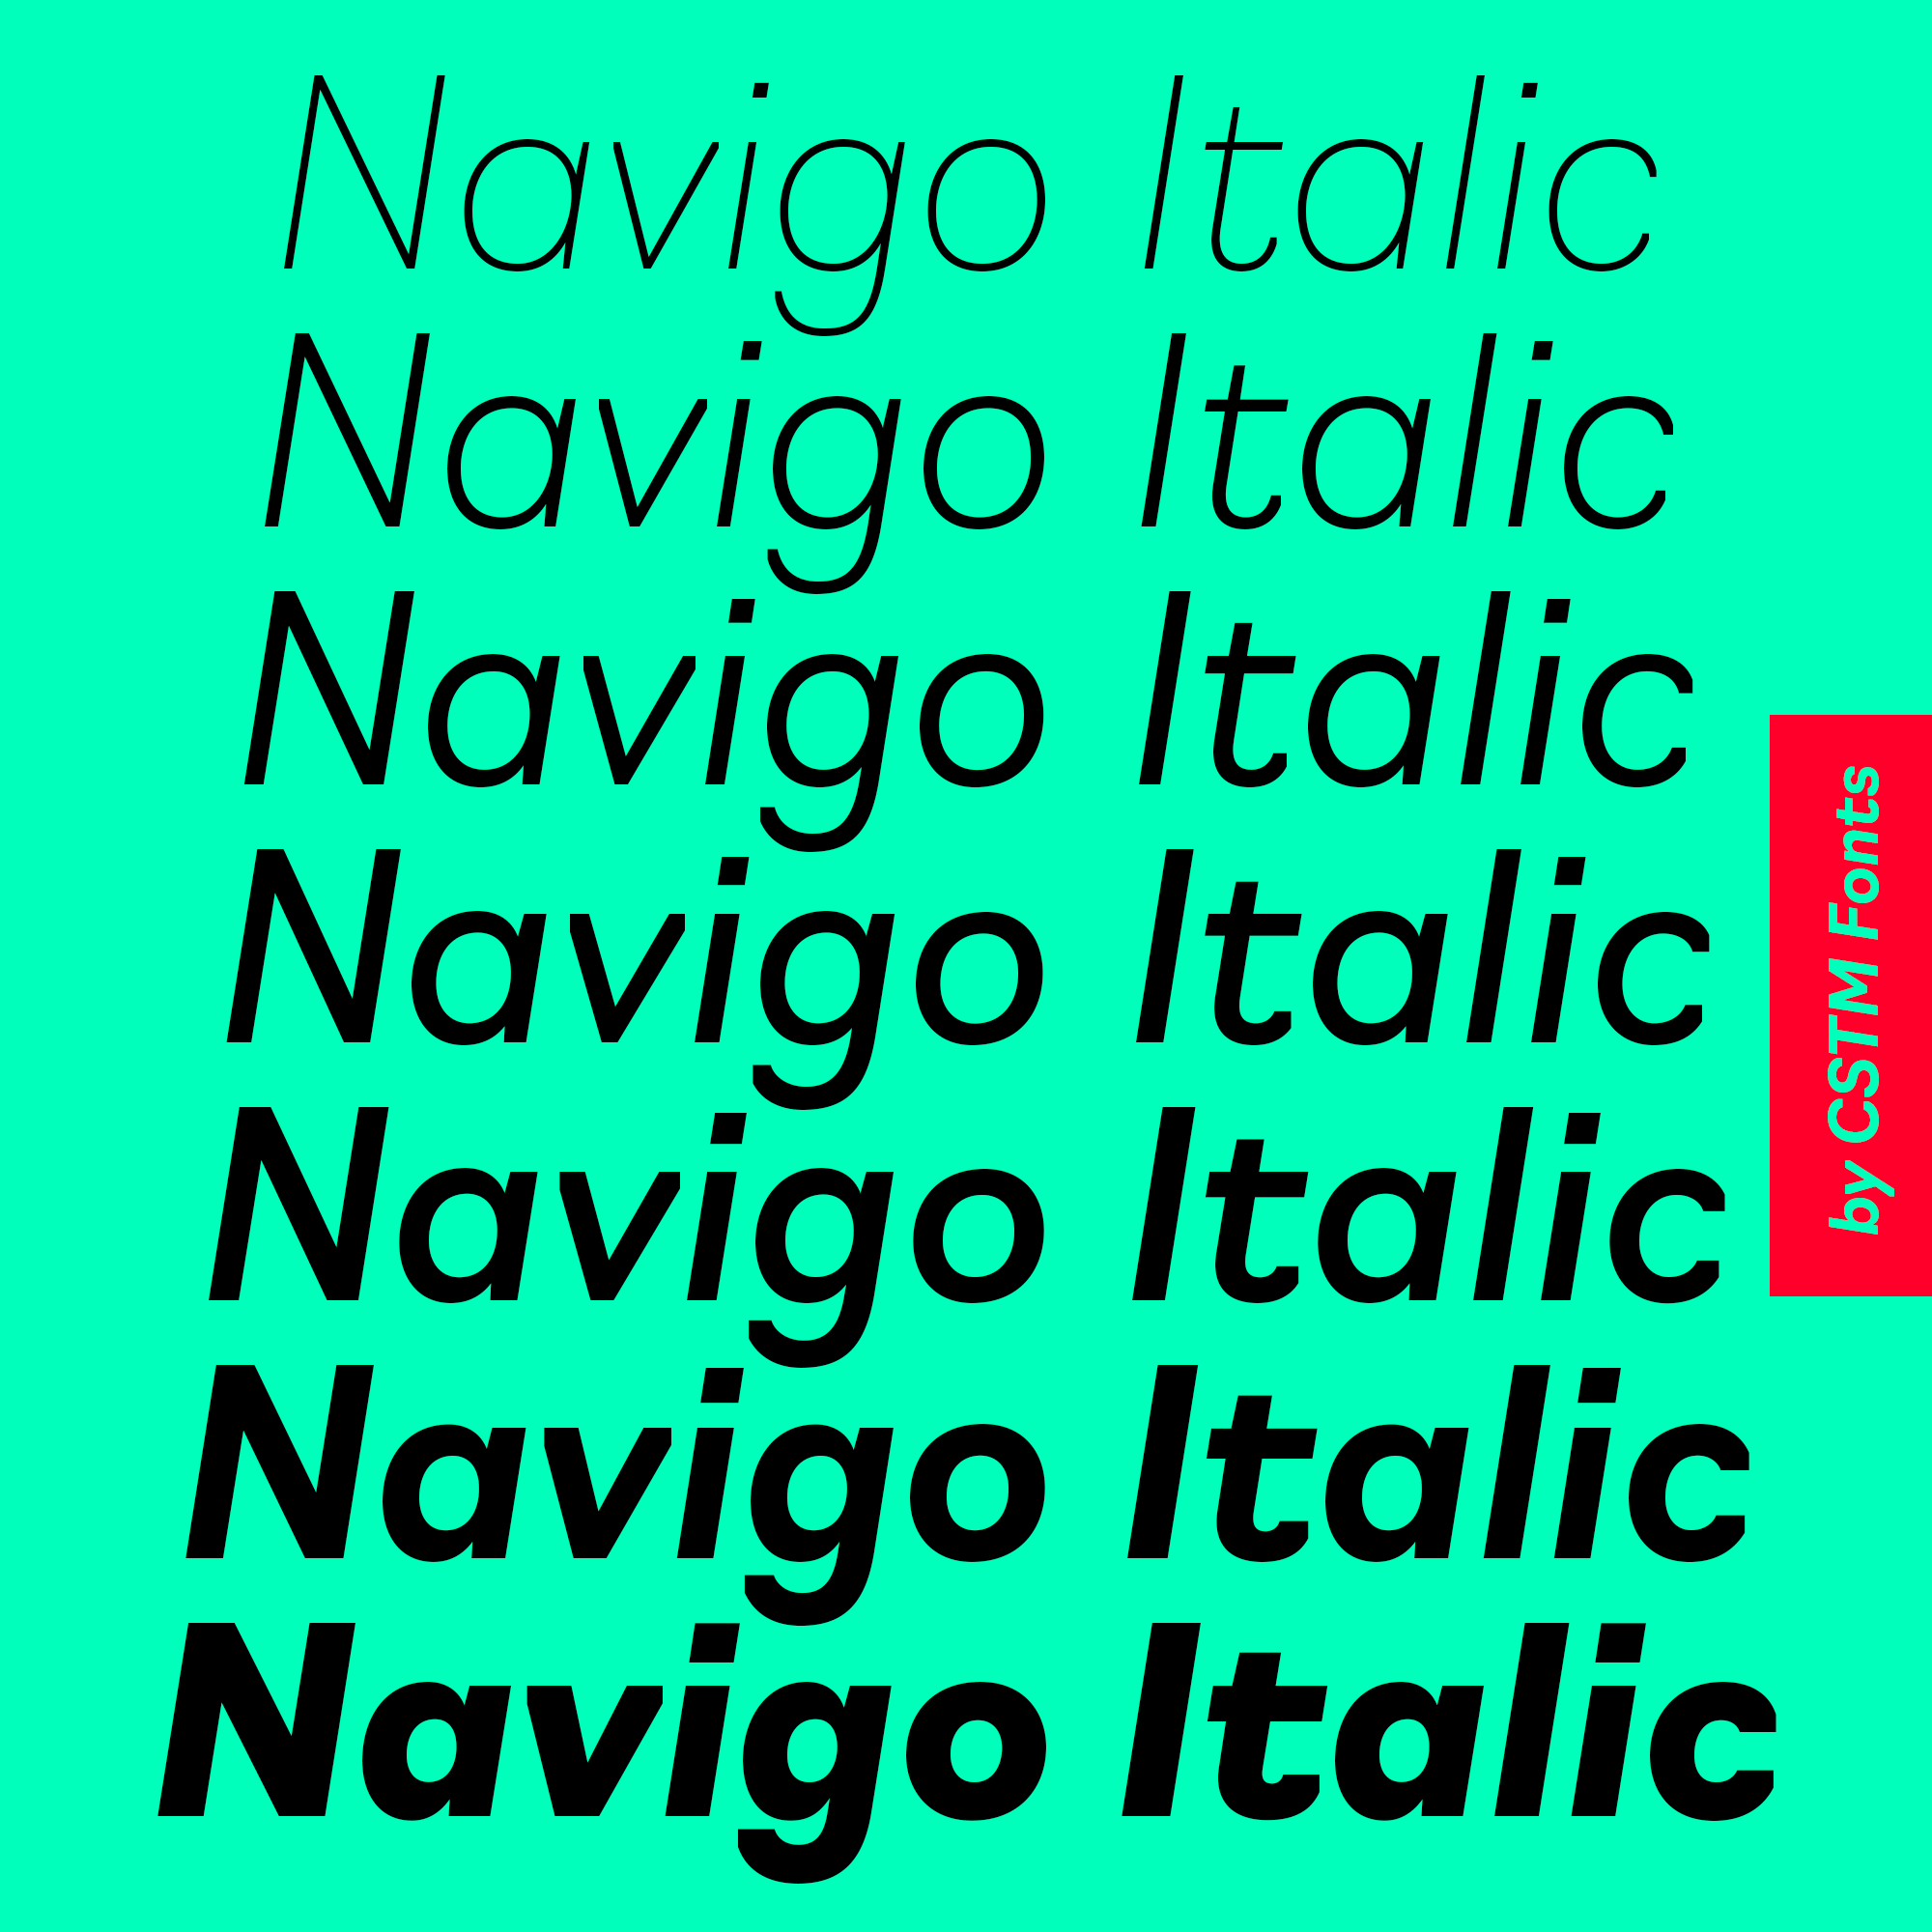 NavigoItalic_01